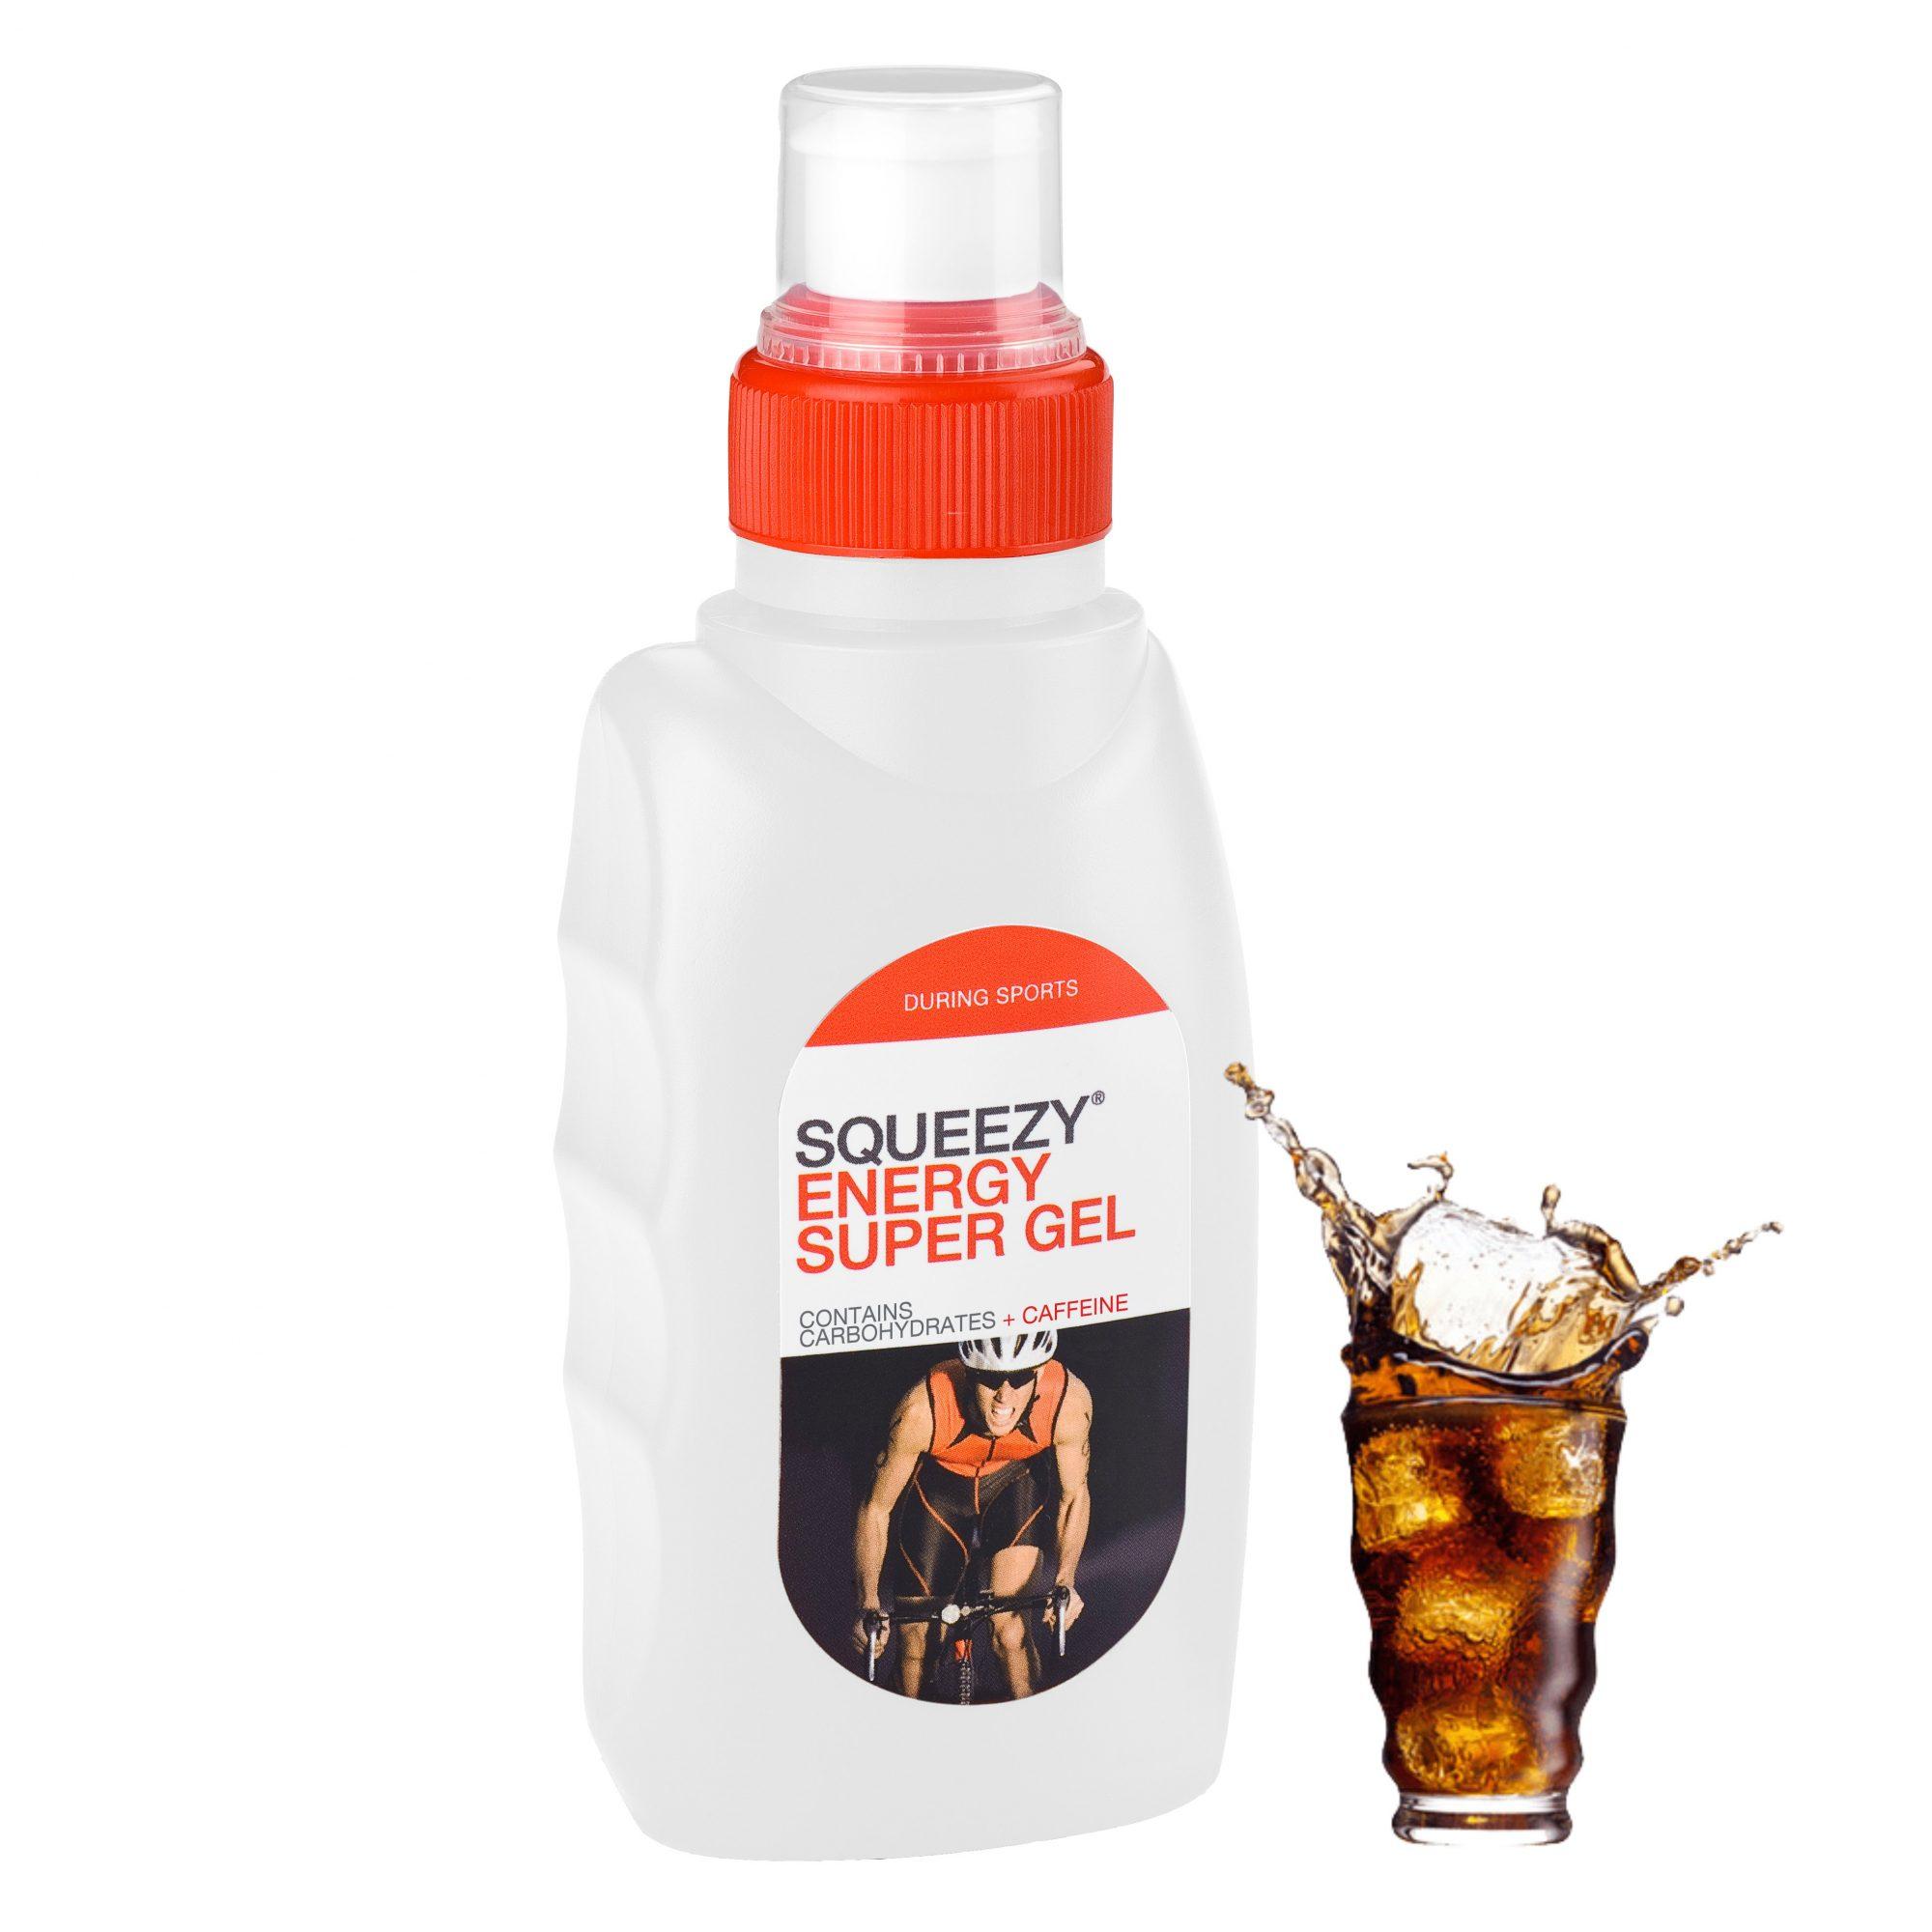 ENERGY SUPER GEL 125 ml